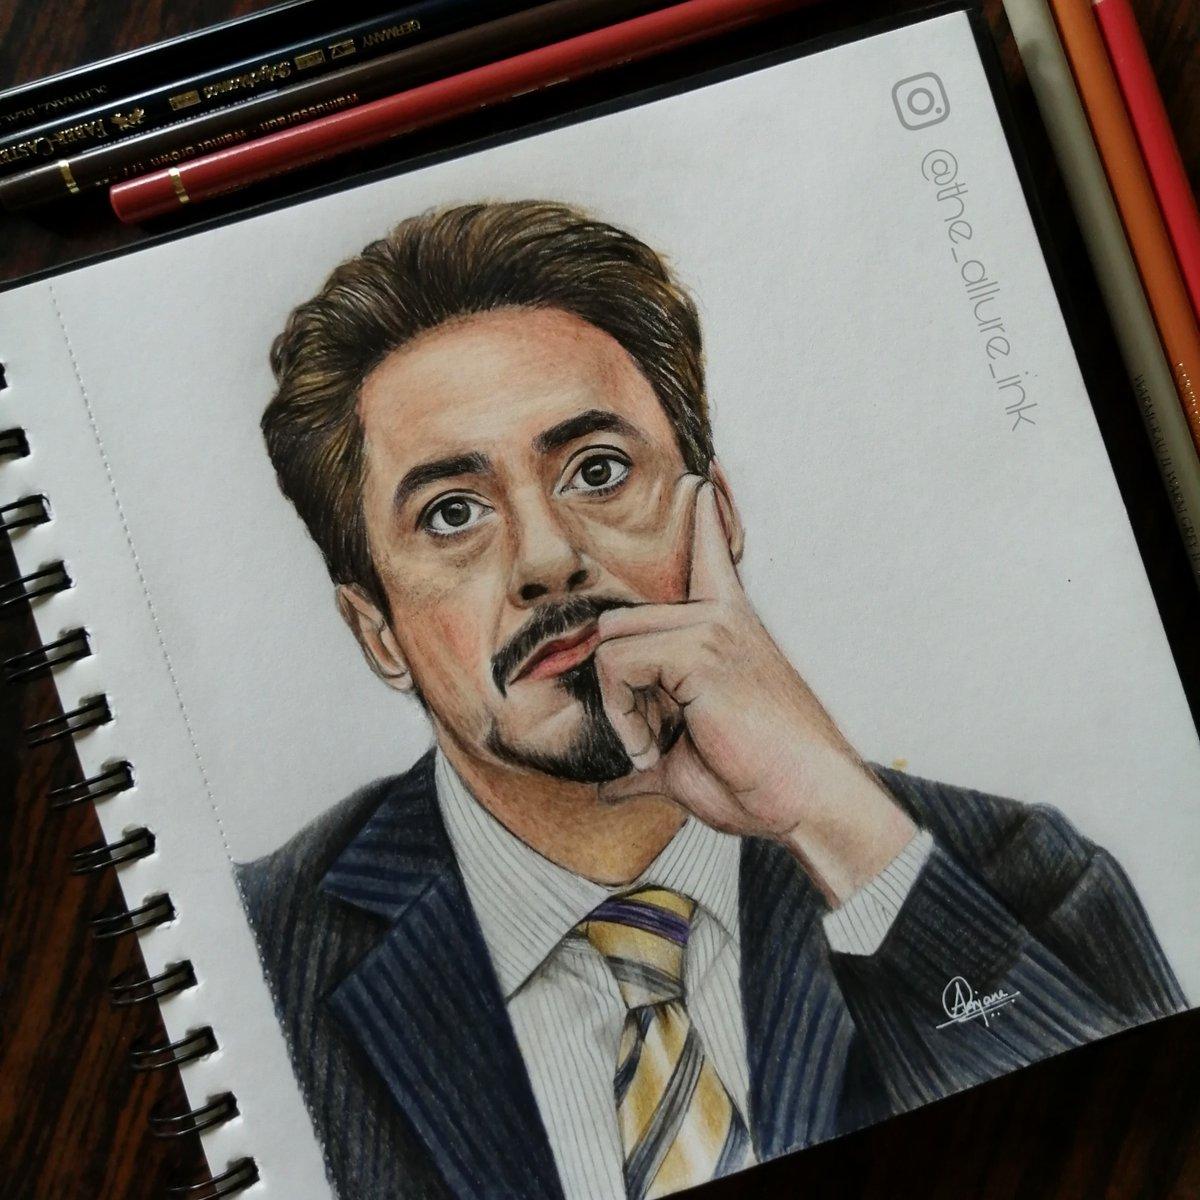 @RobertDowneyJr  Finally drew him#Artist,#fabercastell,#polychromos #passion ,#RDJ ,#lovepic.twitter.com/LaJz9VZZPd